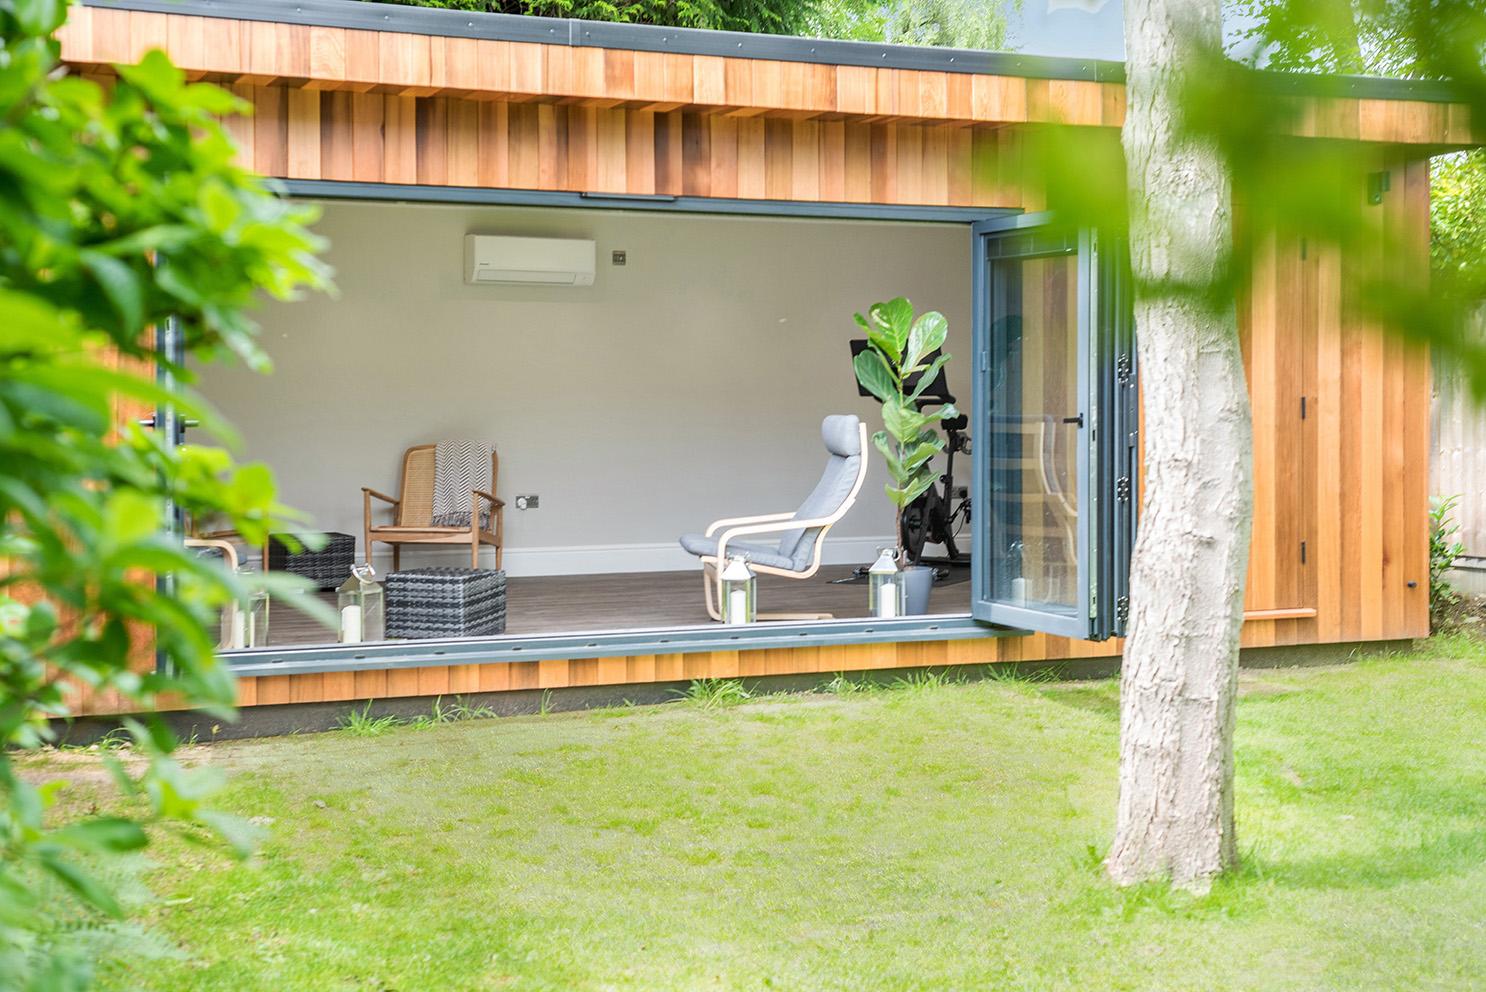 Prestige garden building in Essex